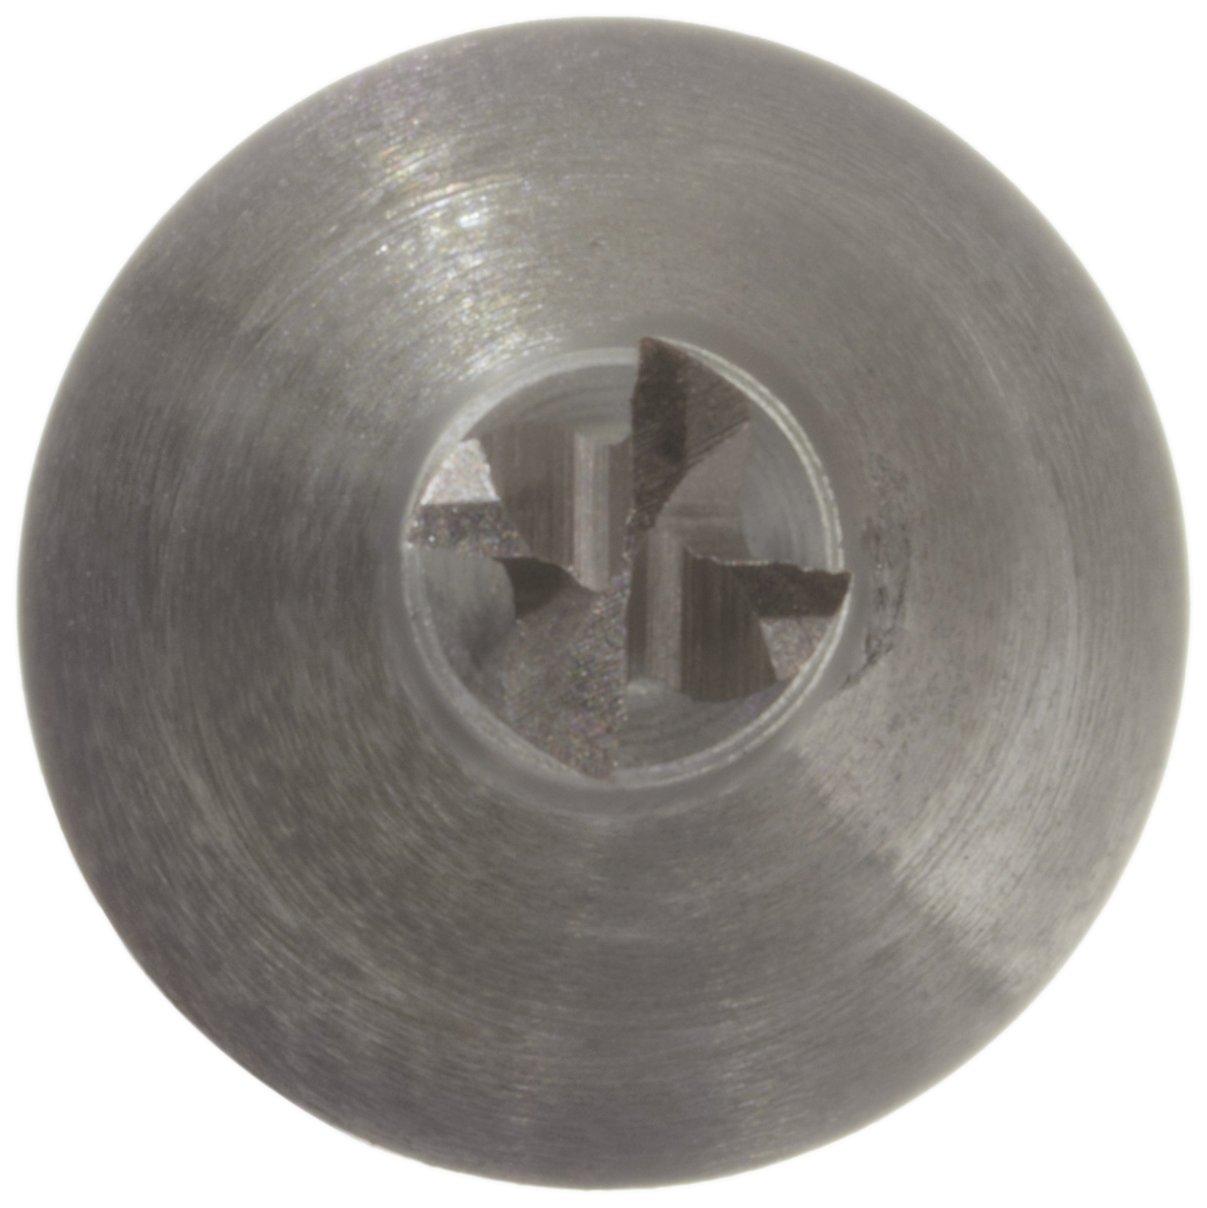 Non-Center Cutting 0.8125 Cutting Diameter Weldon Shank 4 Overall Length Melin Tool C Cobalt Steel Square Nose End Mill 4 Flutes 30 Deg Helix TiCN Monolayer Finish 0.625 Shank Diameter